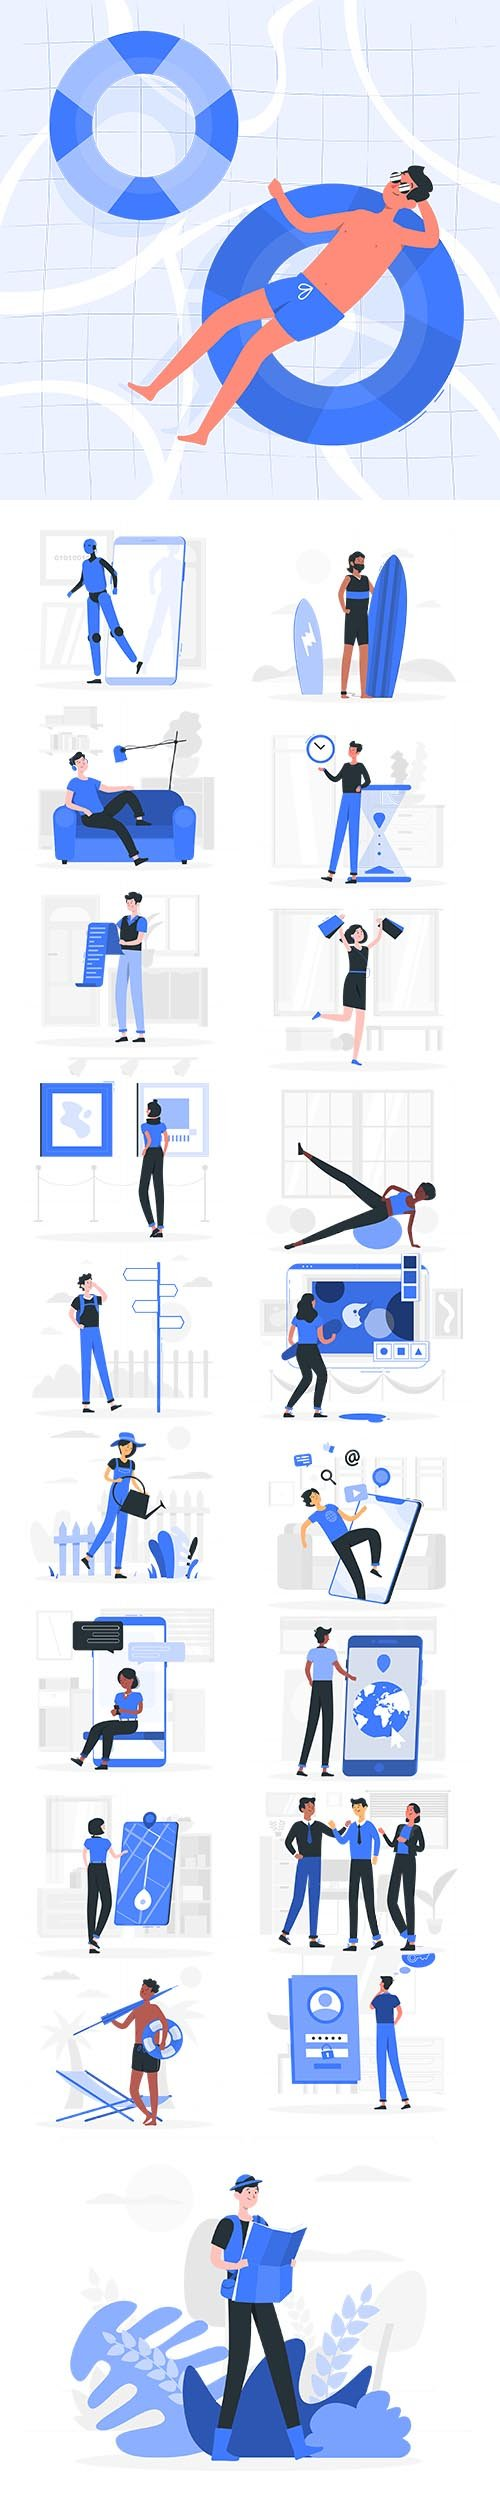 Vector Blu Illustrations People Concept Vol 4